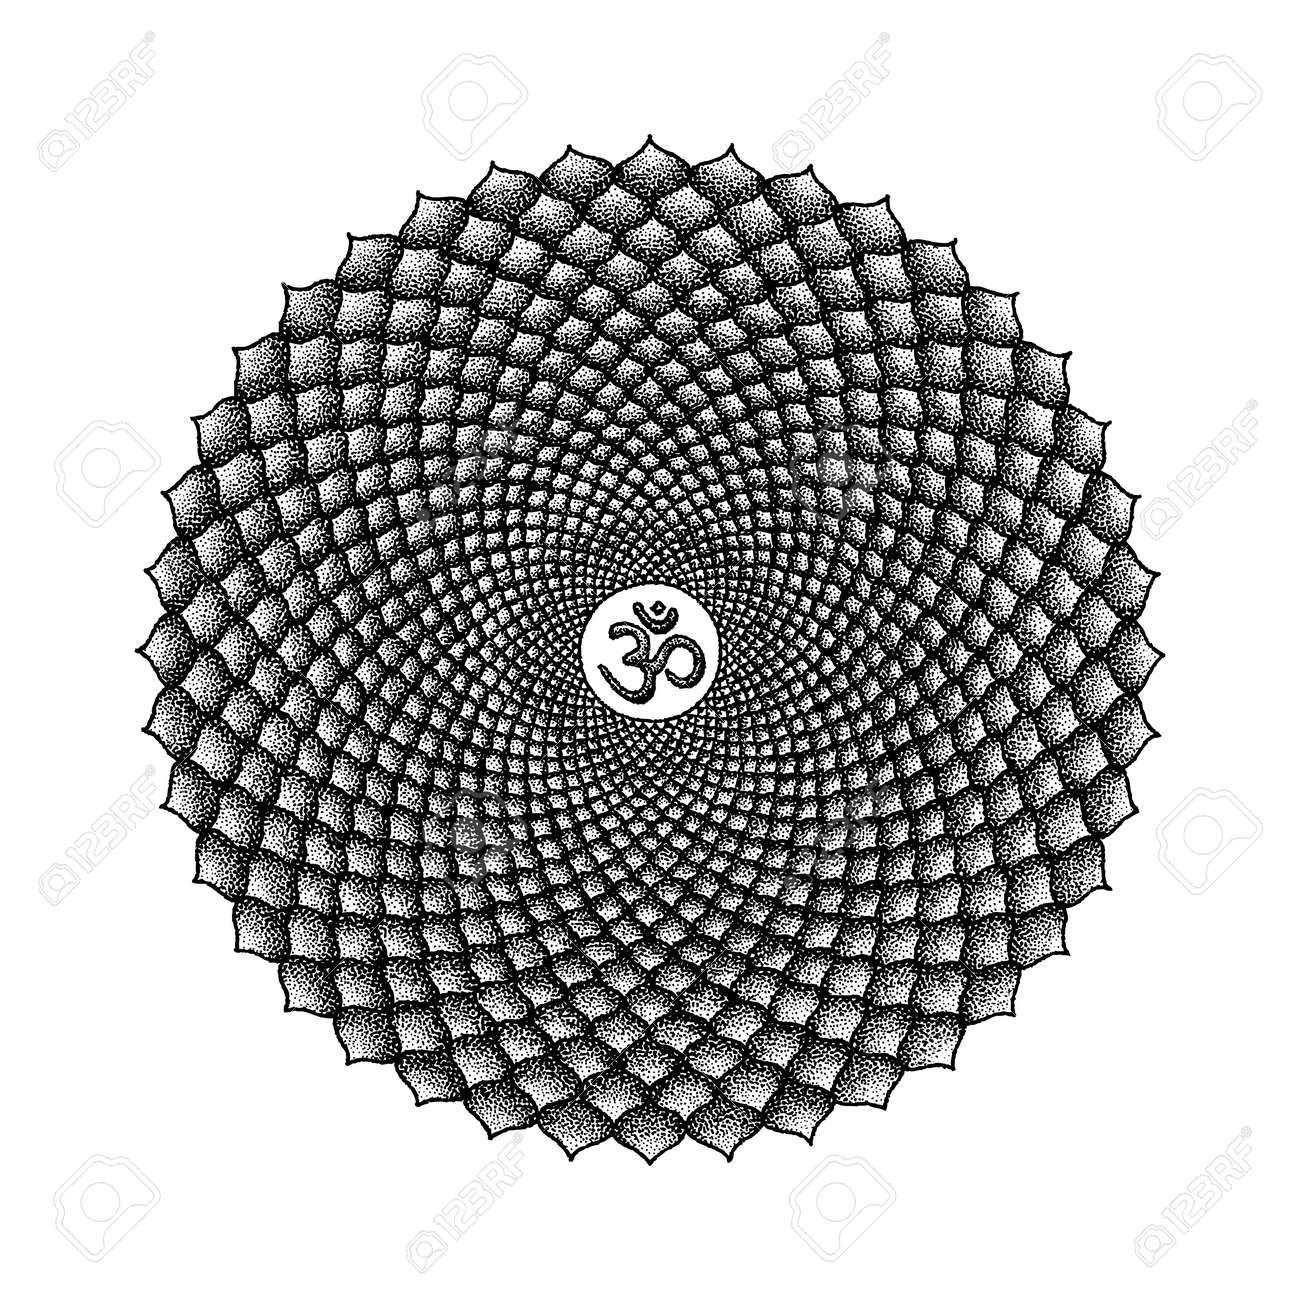 Vector seven primary crown sahasrara chakra sanskrit seed mantra om vector seven primary crown sahasrara chakra sanskrit seed mantra om hinduism syllable one thousand lotus petals buycottarizona Image collections